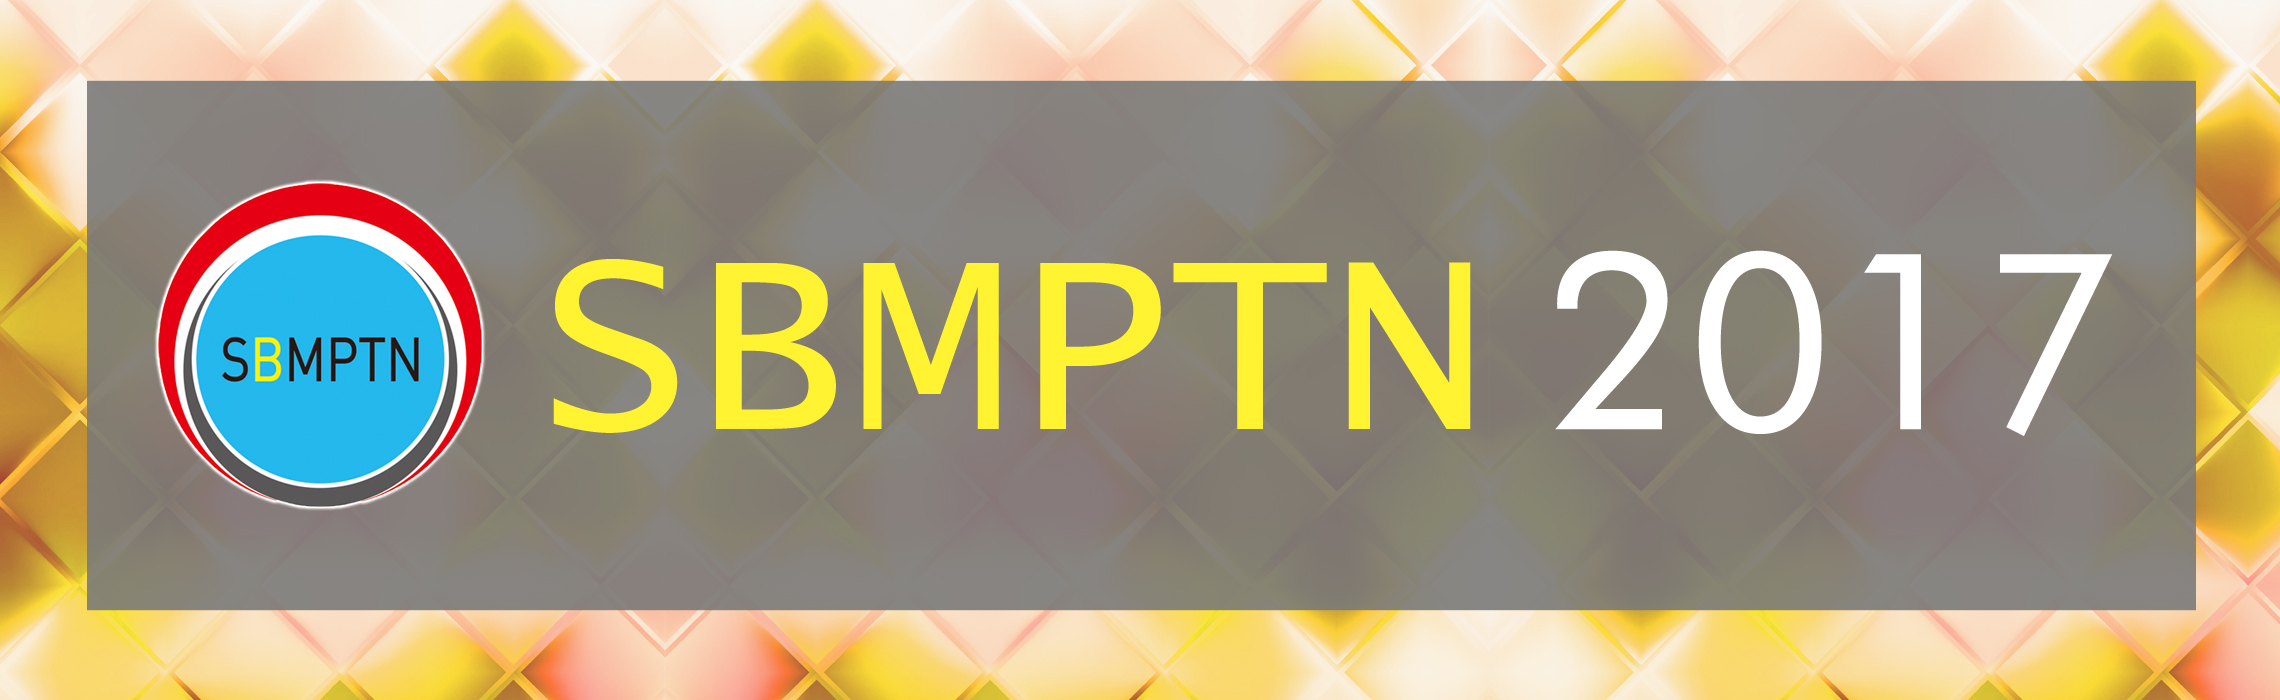 SBMPTN-banner-copy